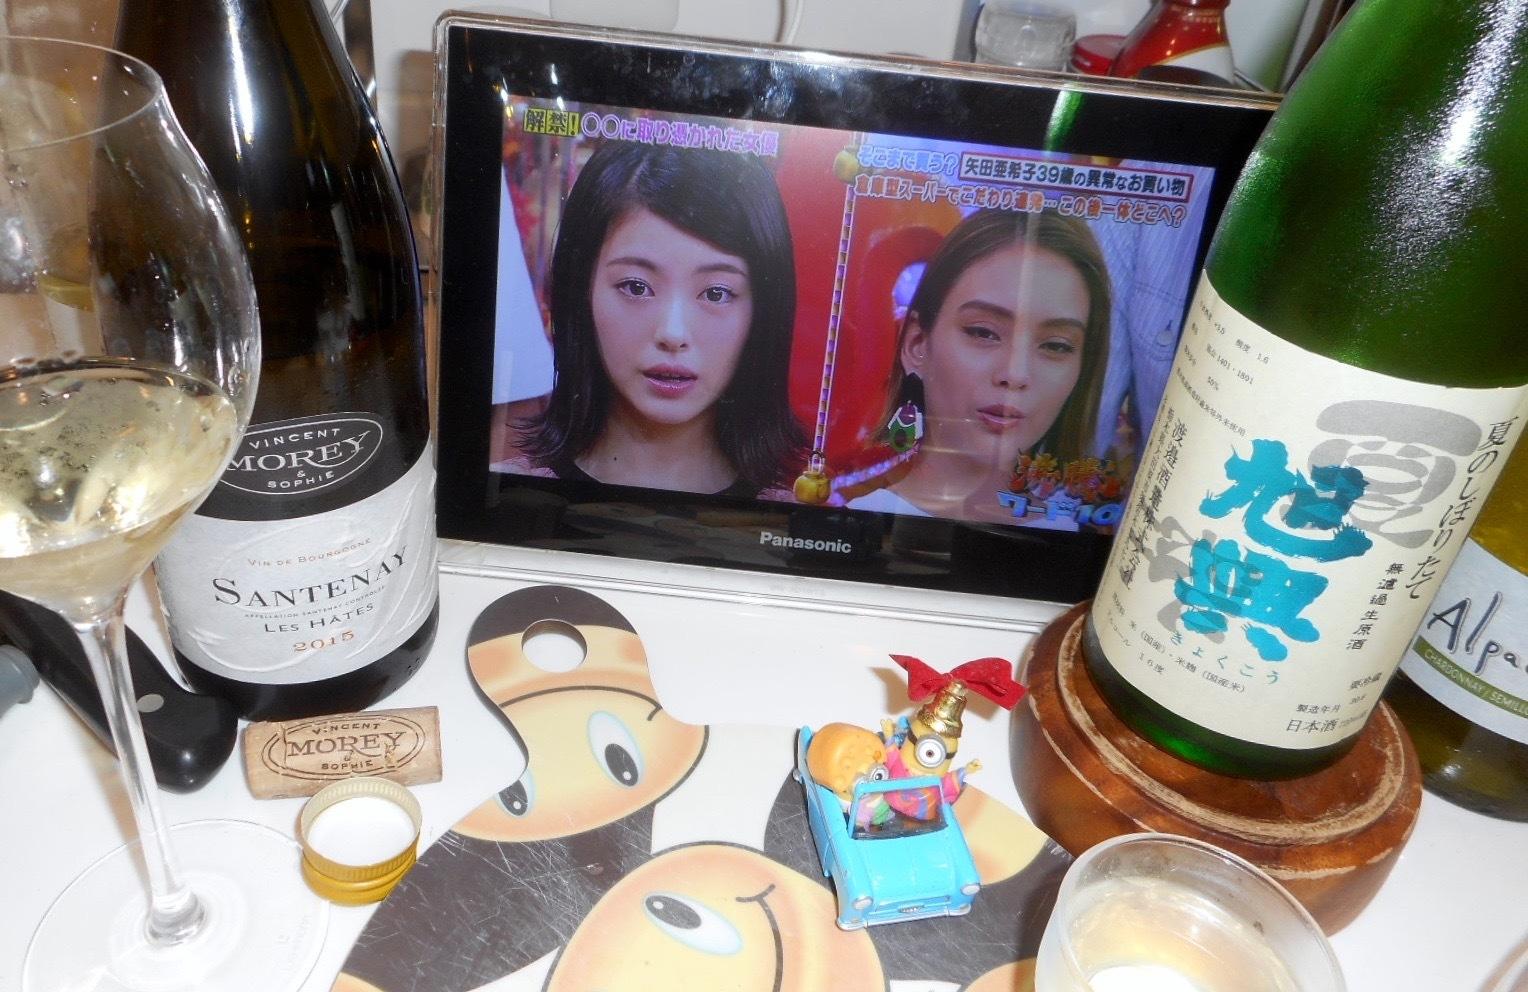 浜辺美波最強論vs滝沢カレン1